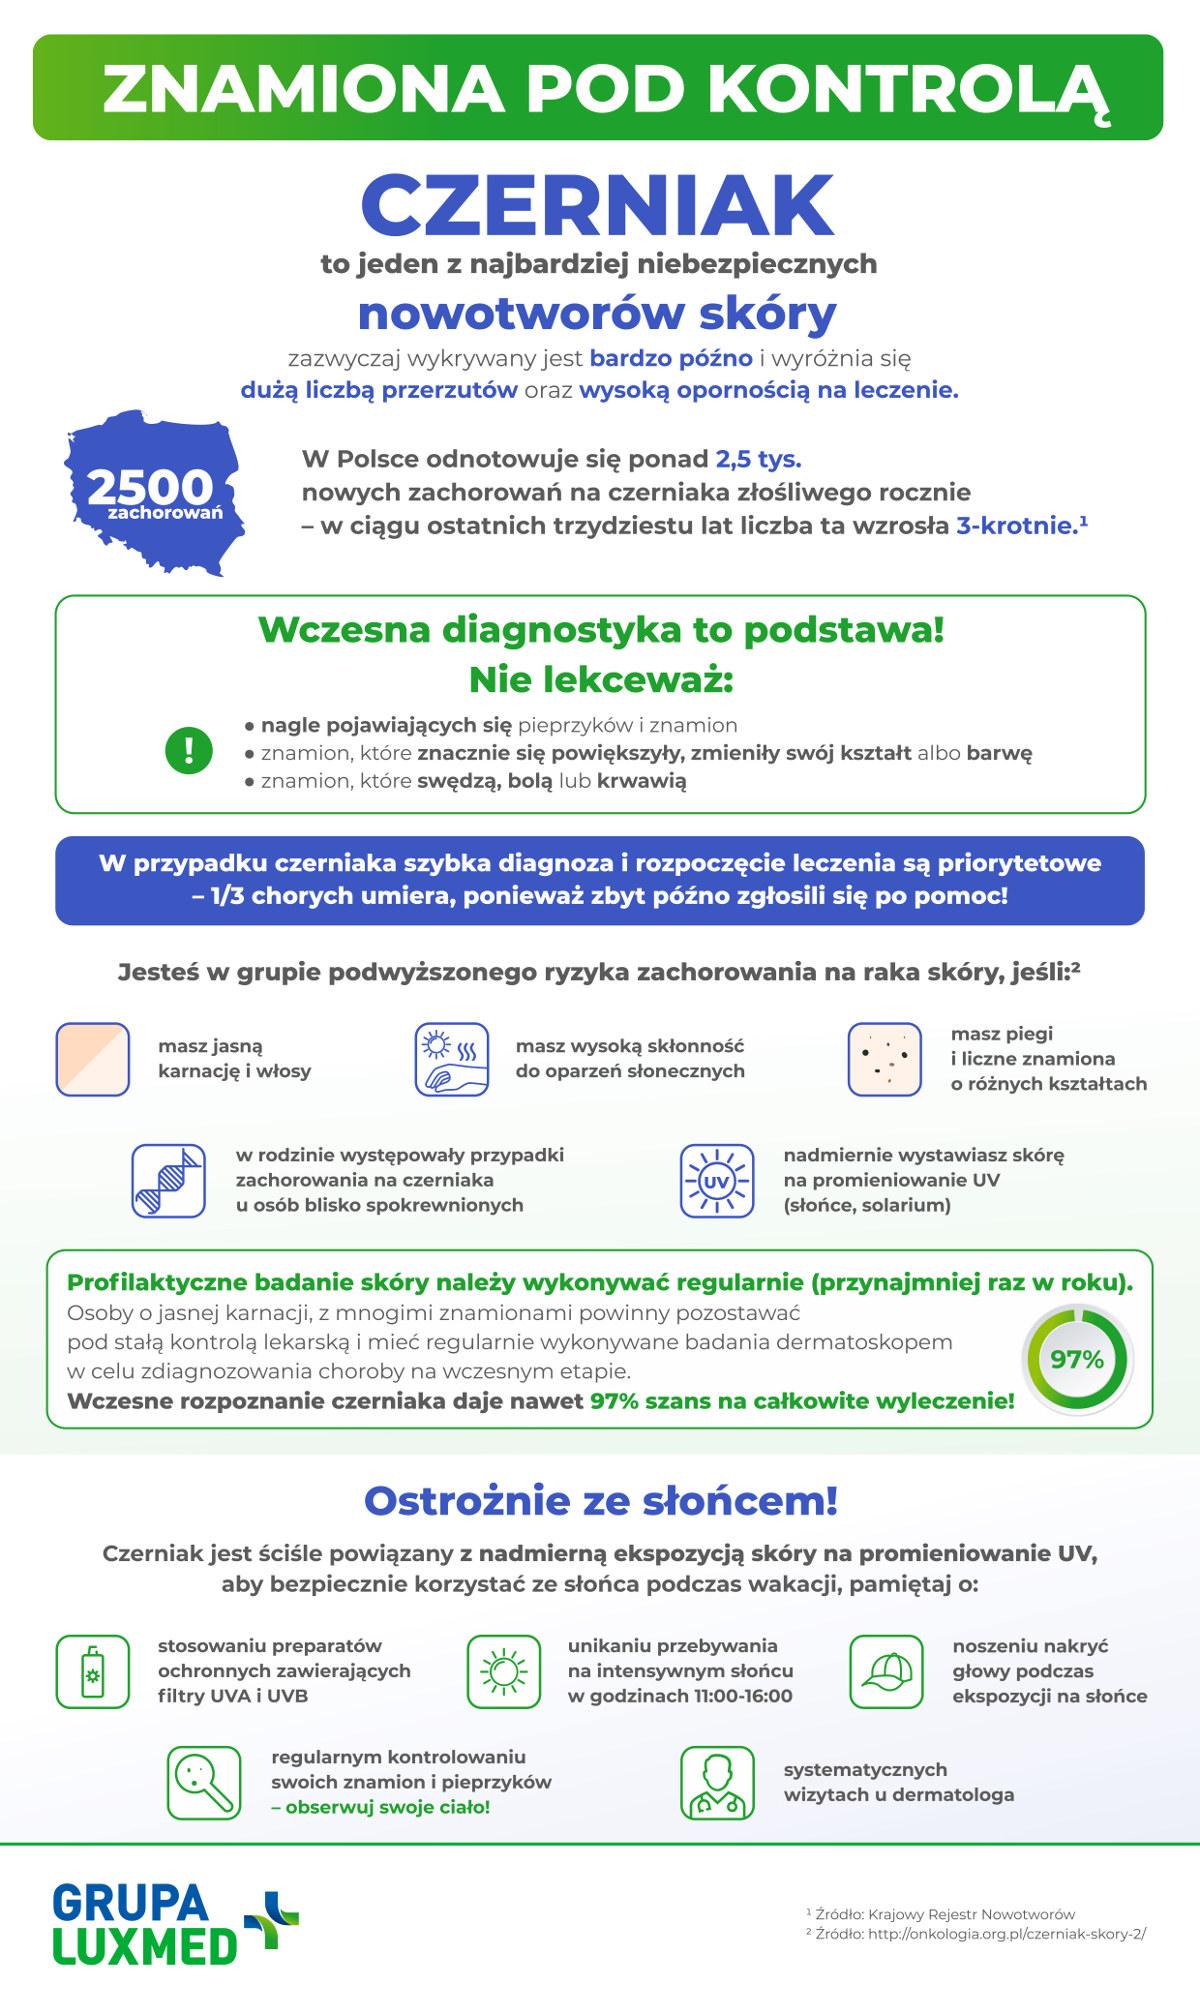 LUXMED_Znamiona_pod_kontrola_infografika_JPG